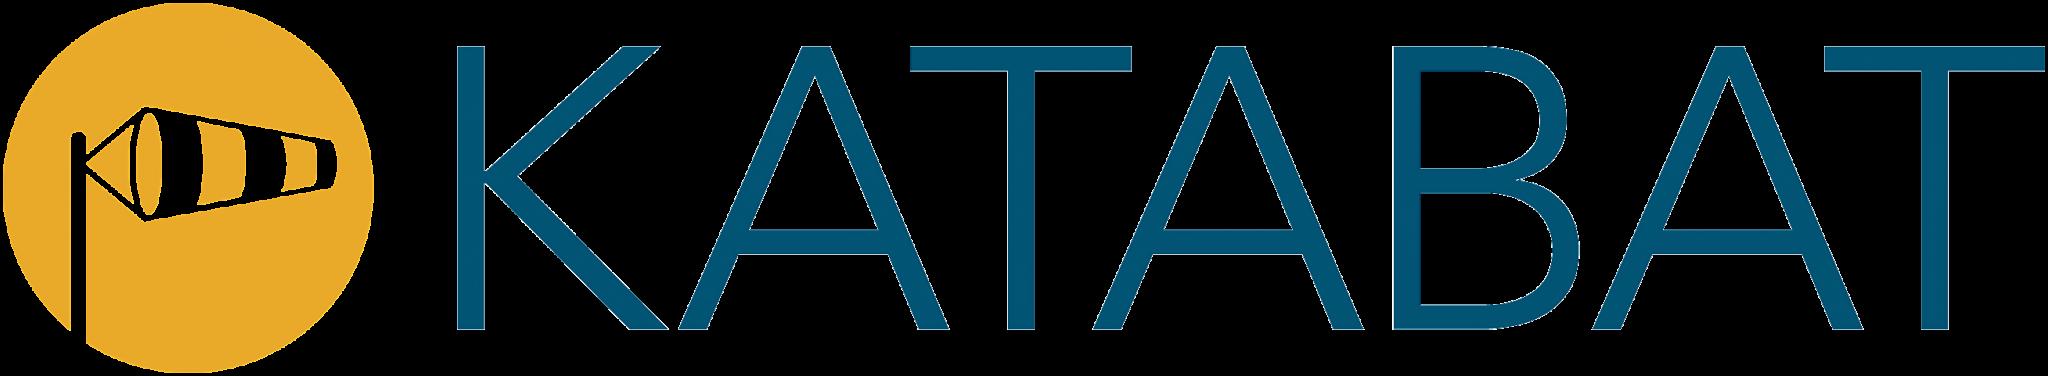 Katabat, Inc.